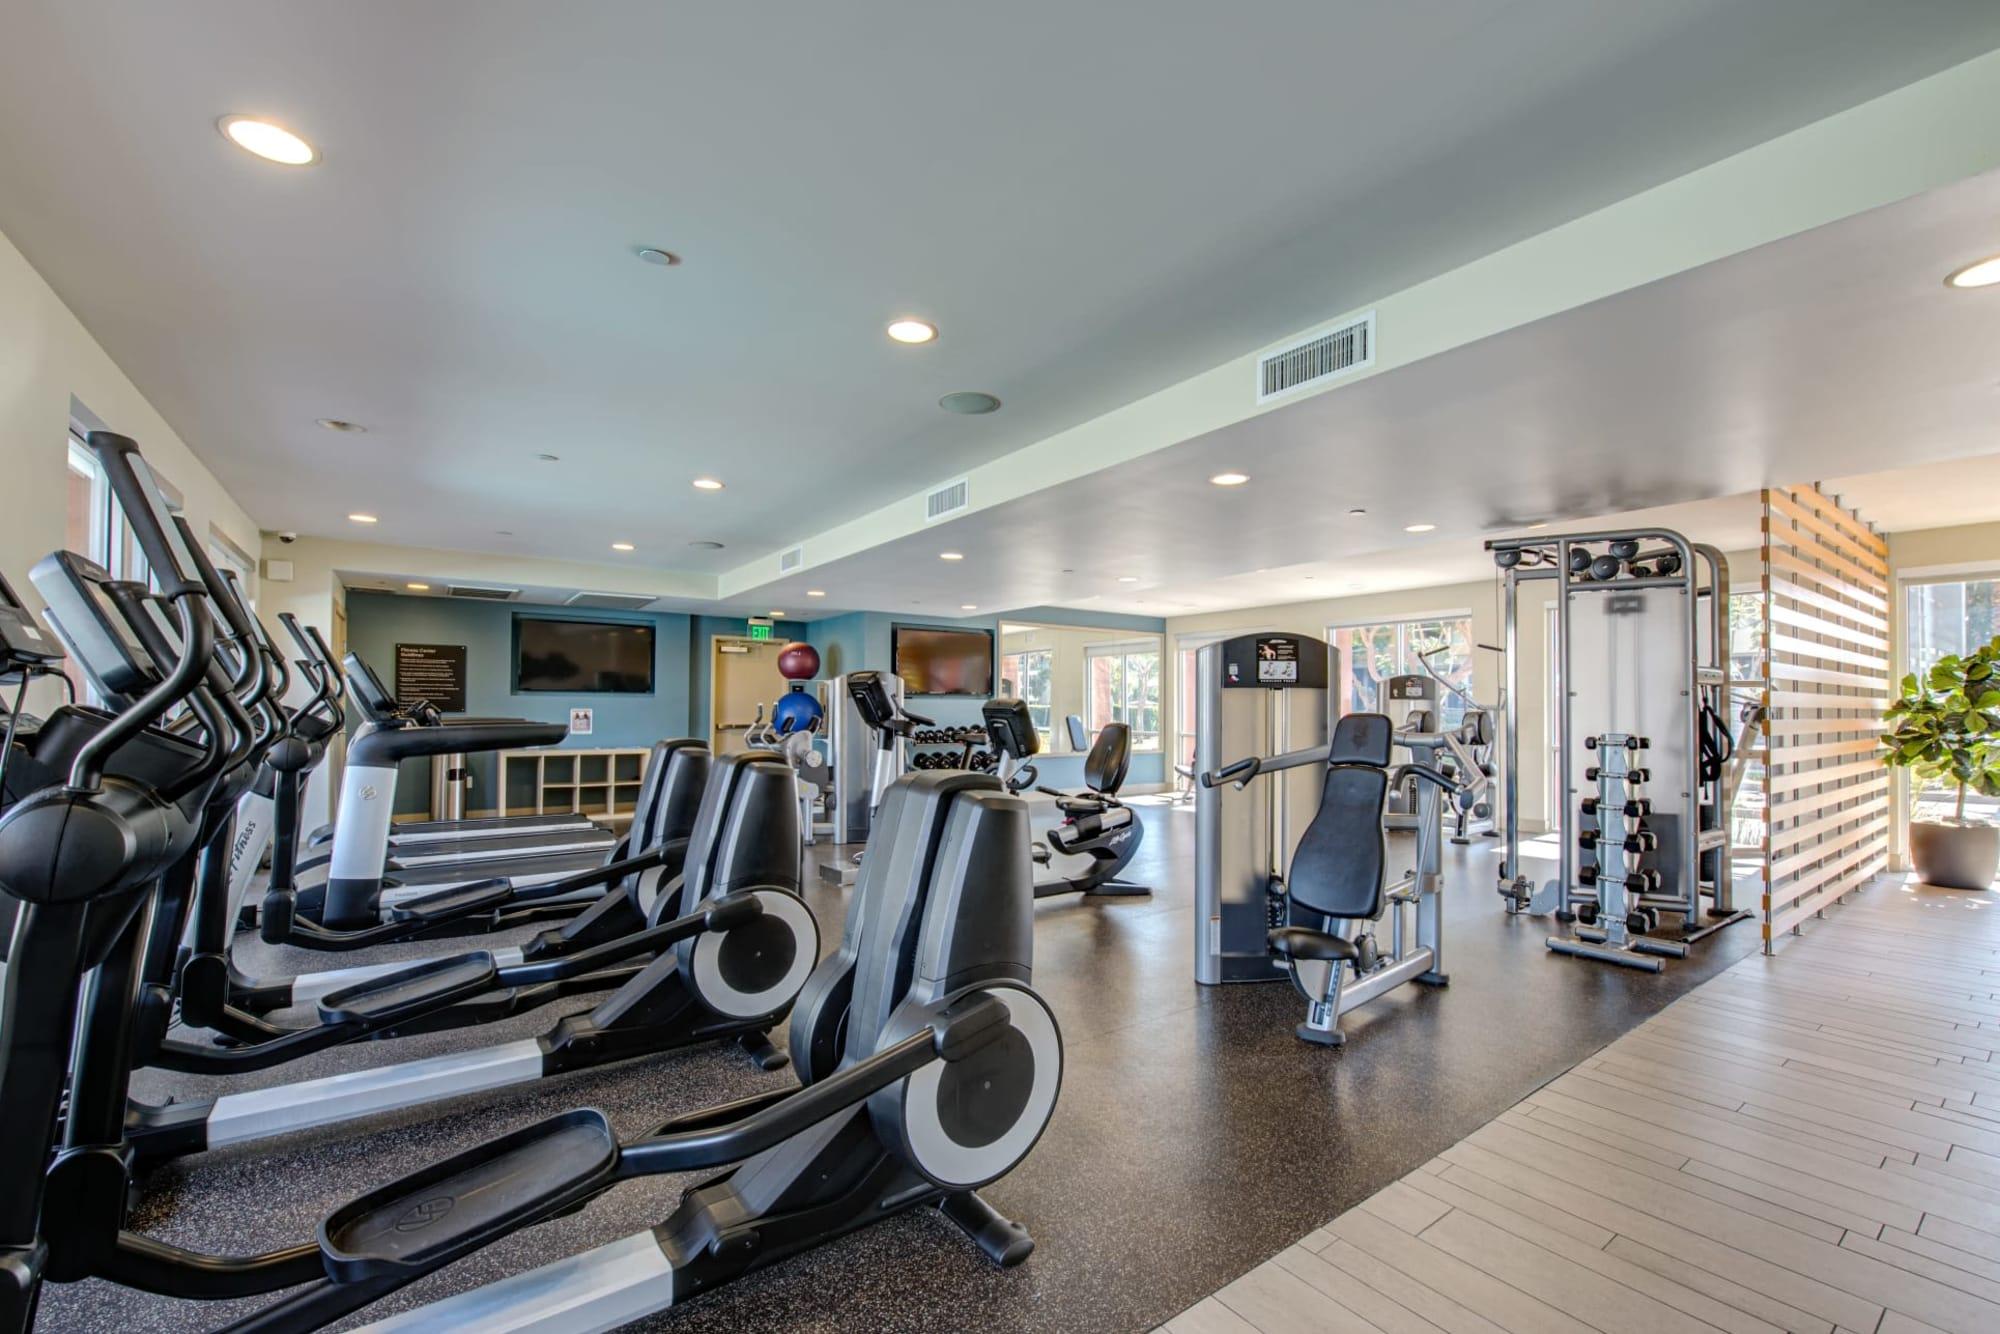 State-of-the-art fitness equipment at Harborside Marina Bay Apartments in Marina del Rey, California